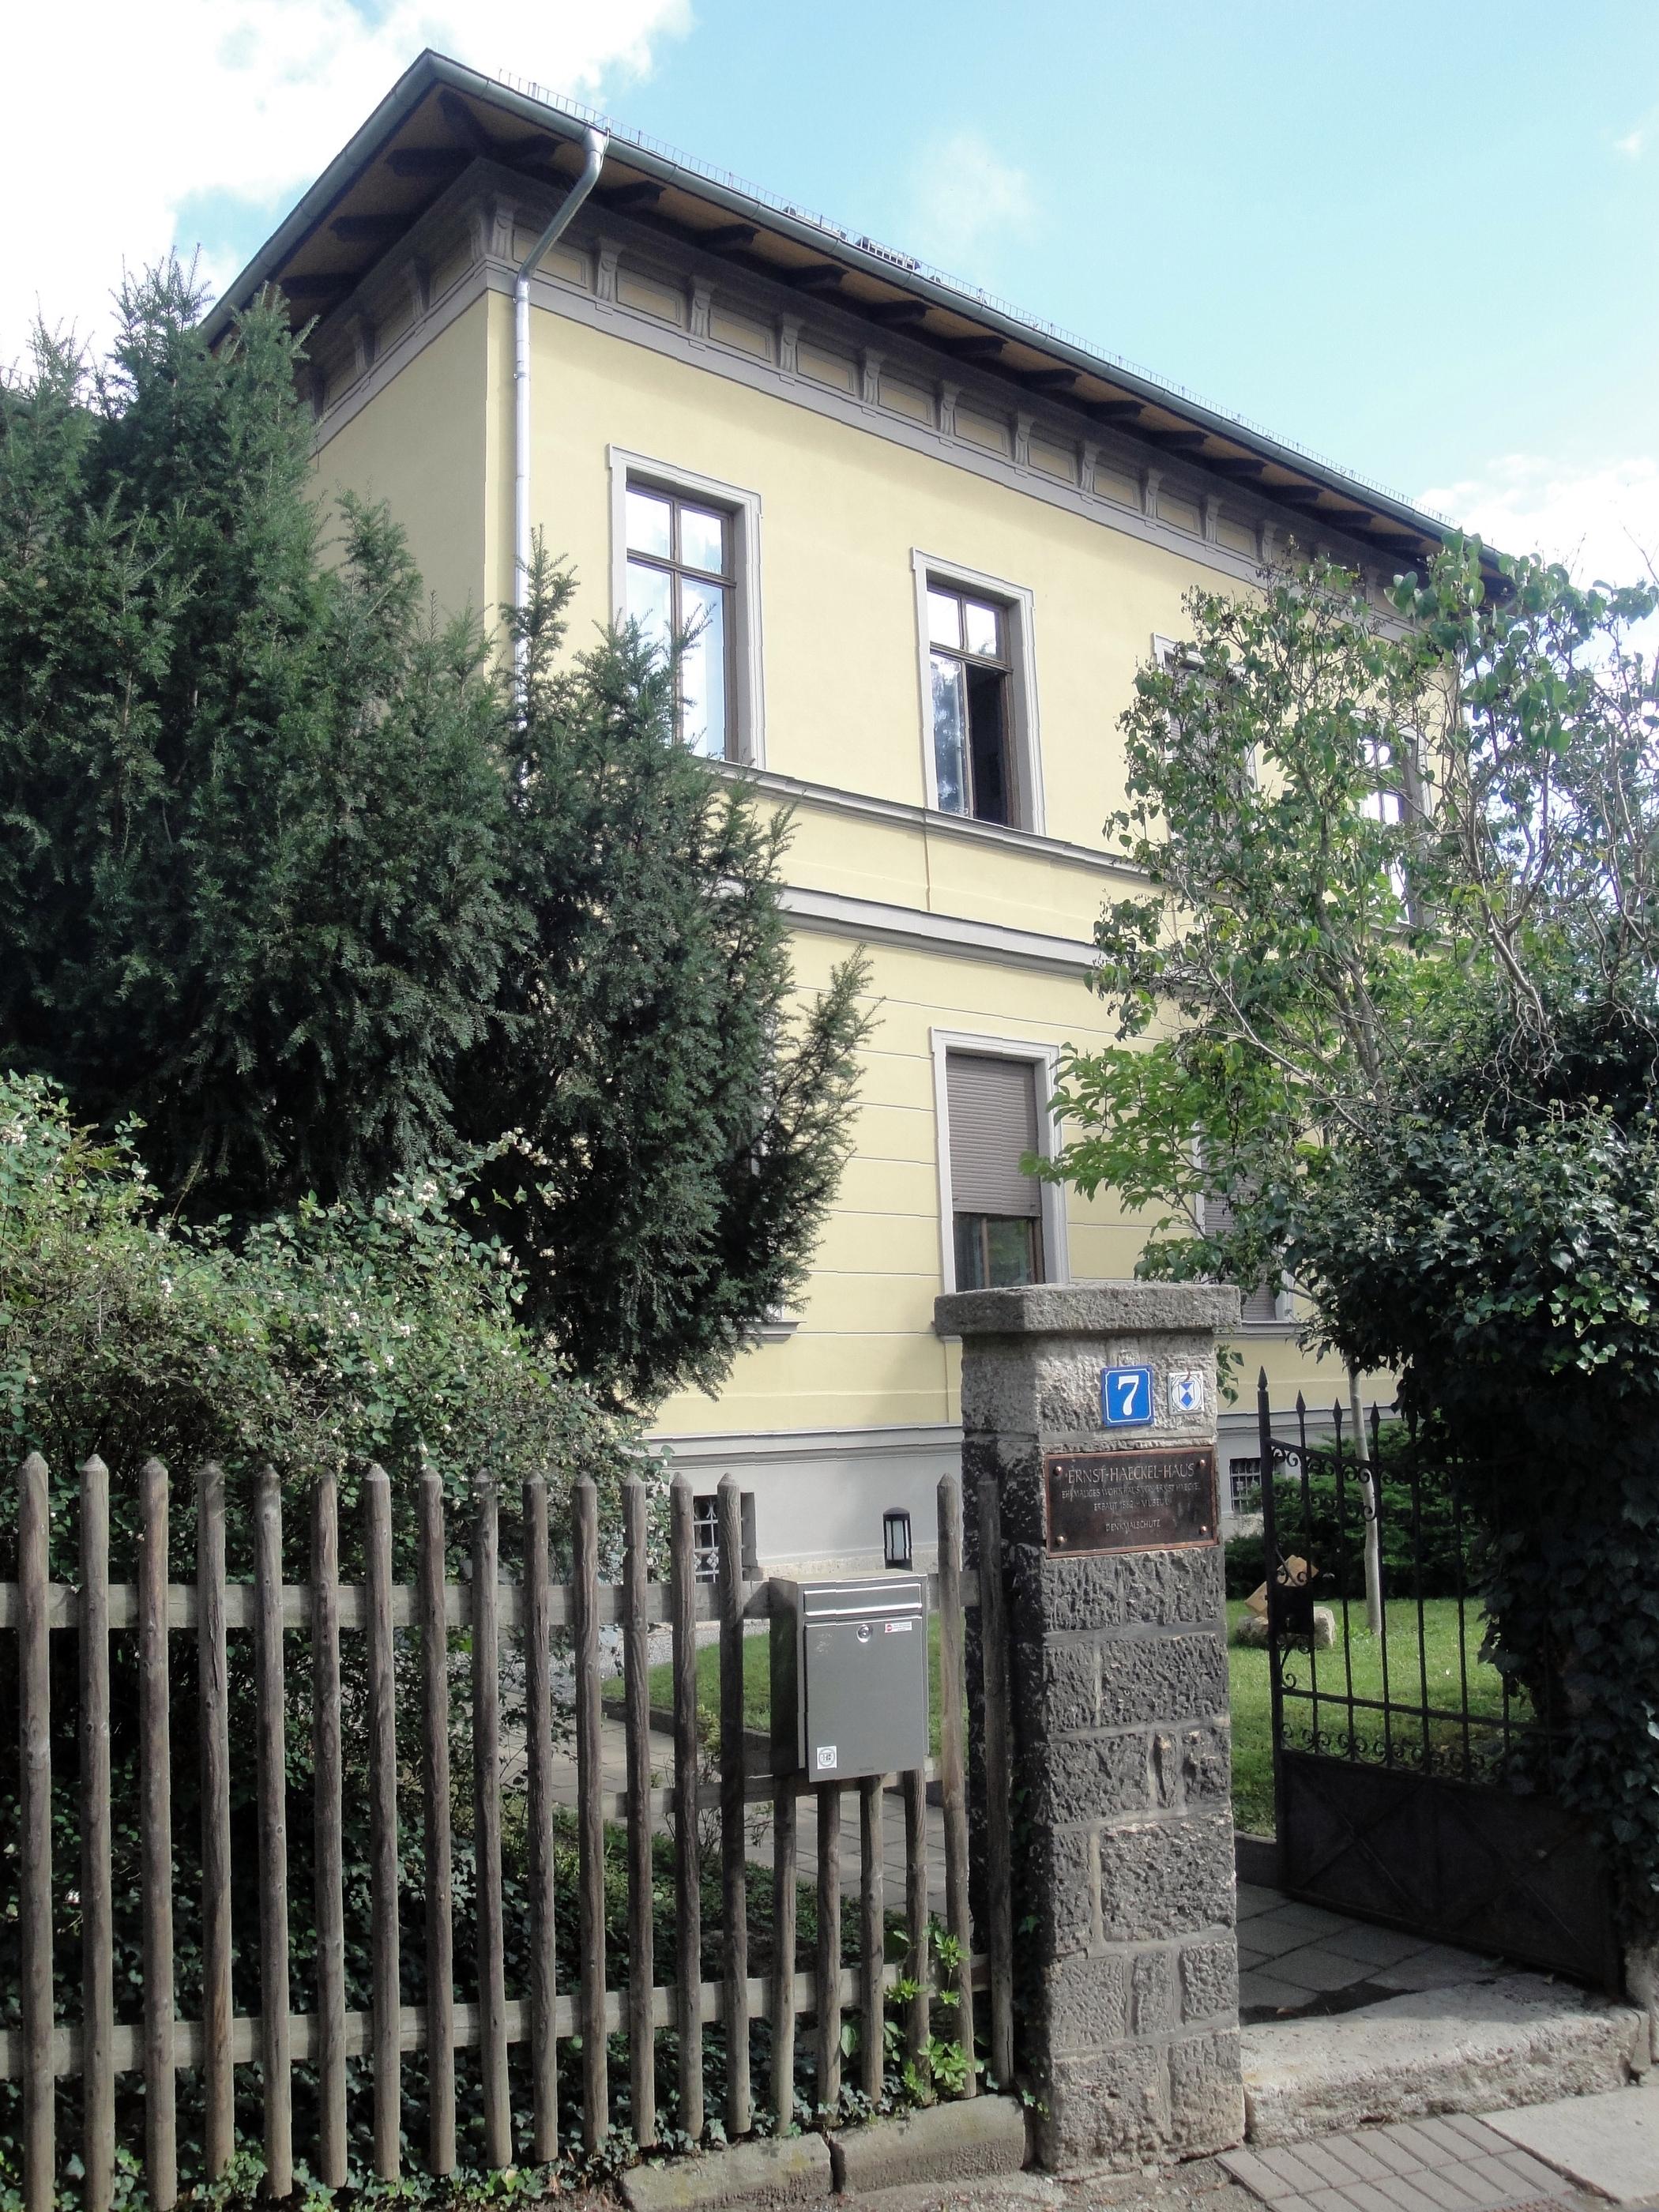 File Jena Ernst Haeckel Haus 01 Jpg Wikimedia Commons